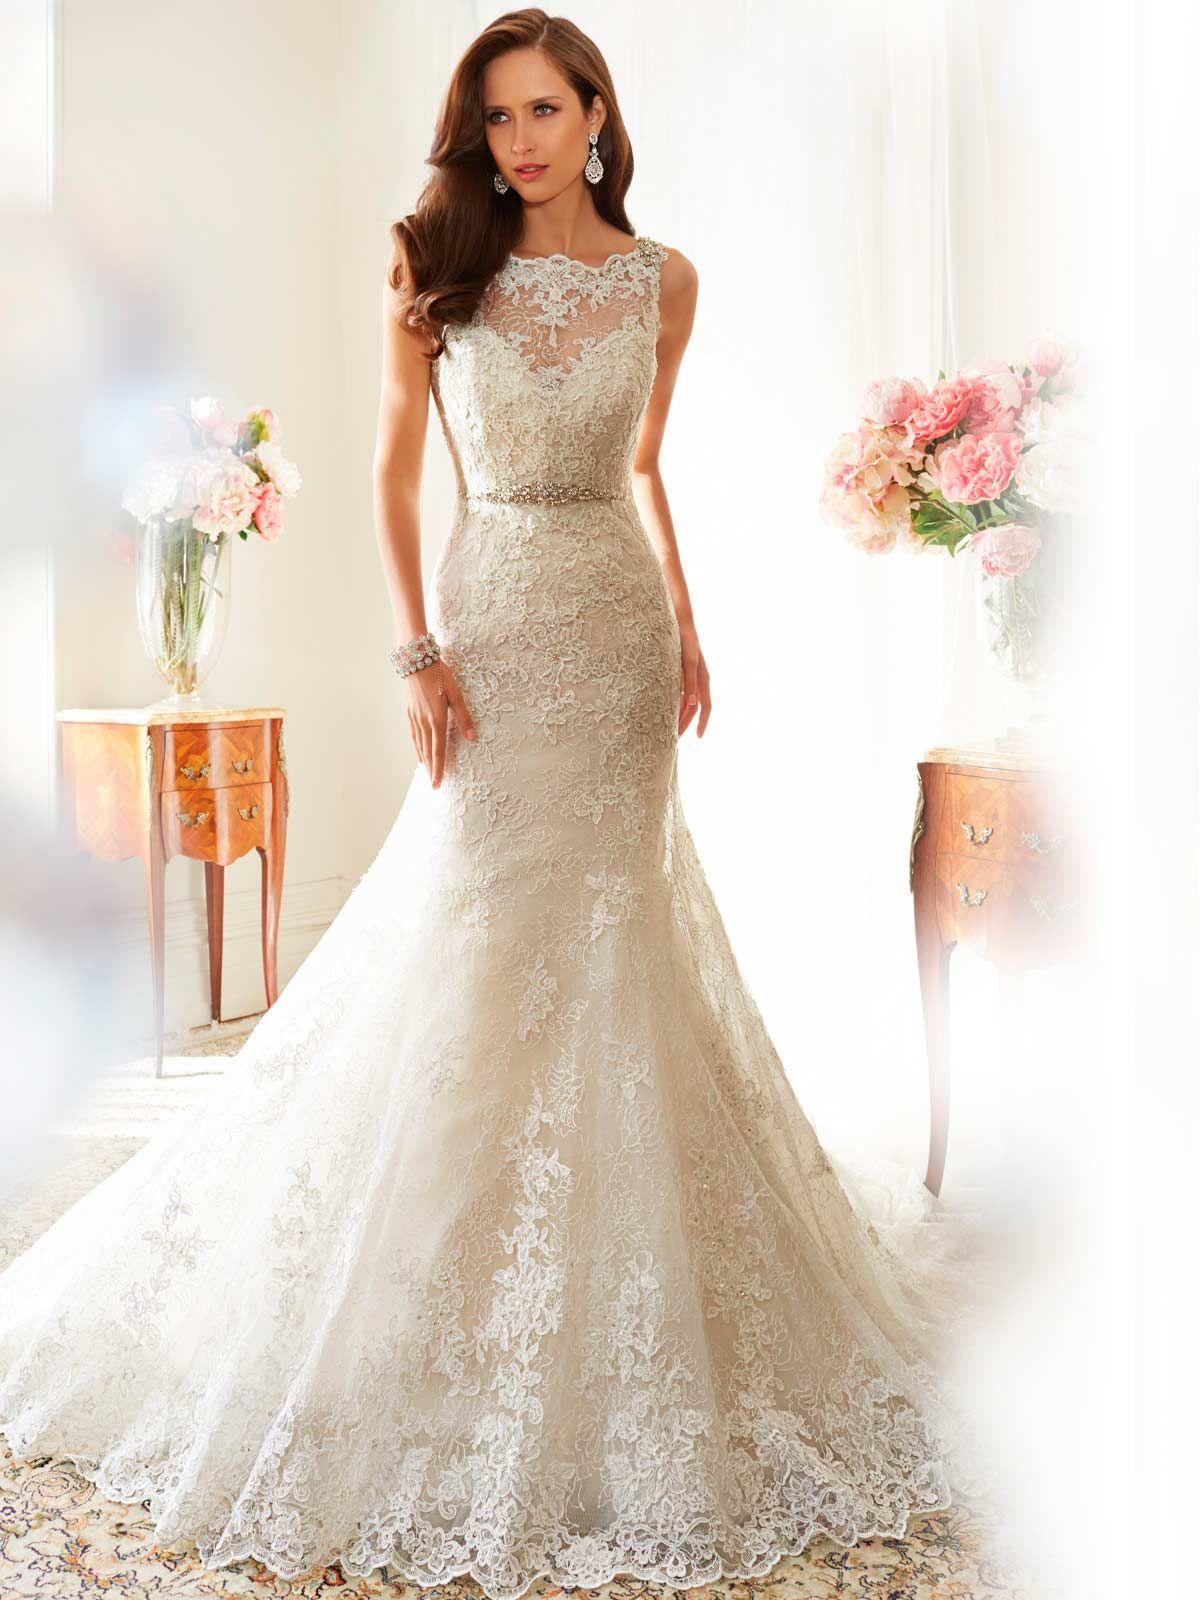 Sophia Tolli Spring 2015 Wedding Gowns   karima   Pinterest   Bridal ...